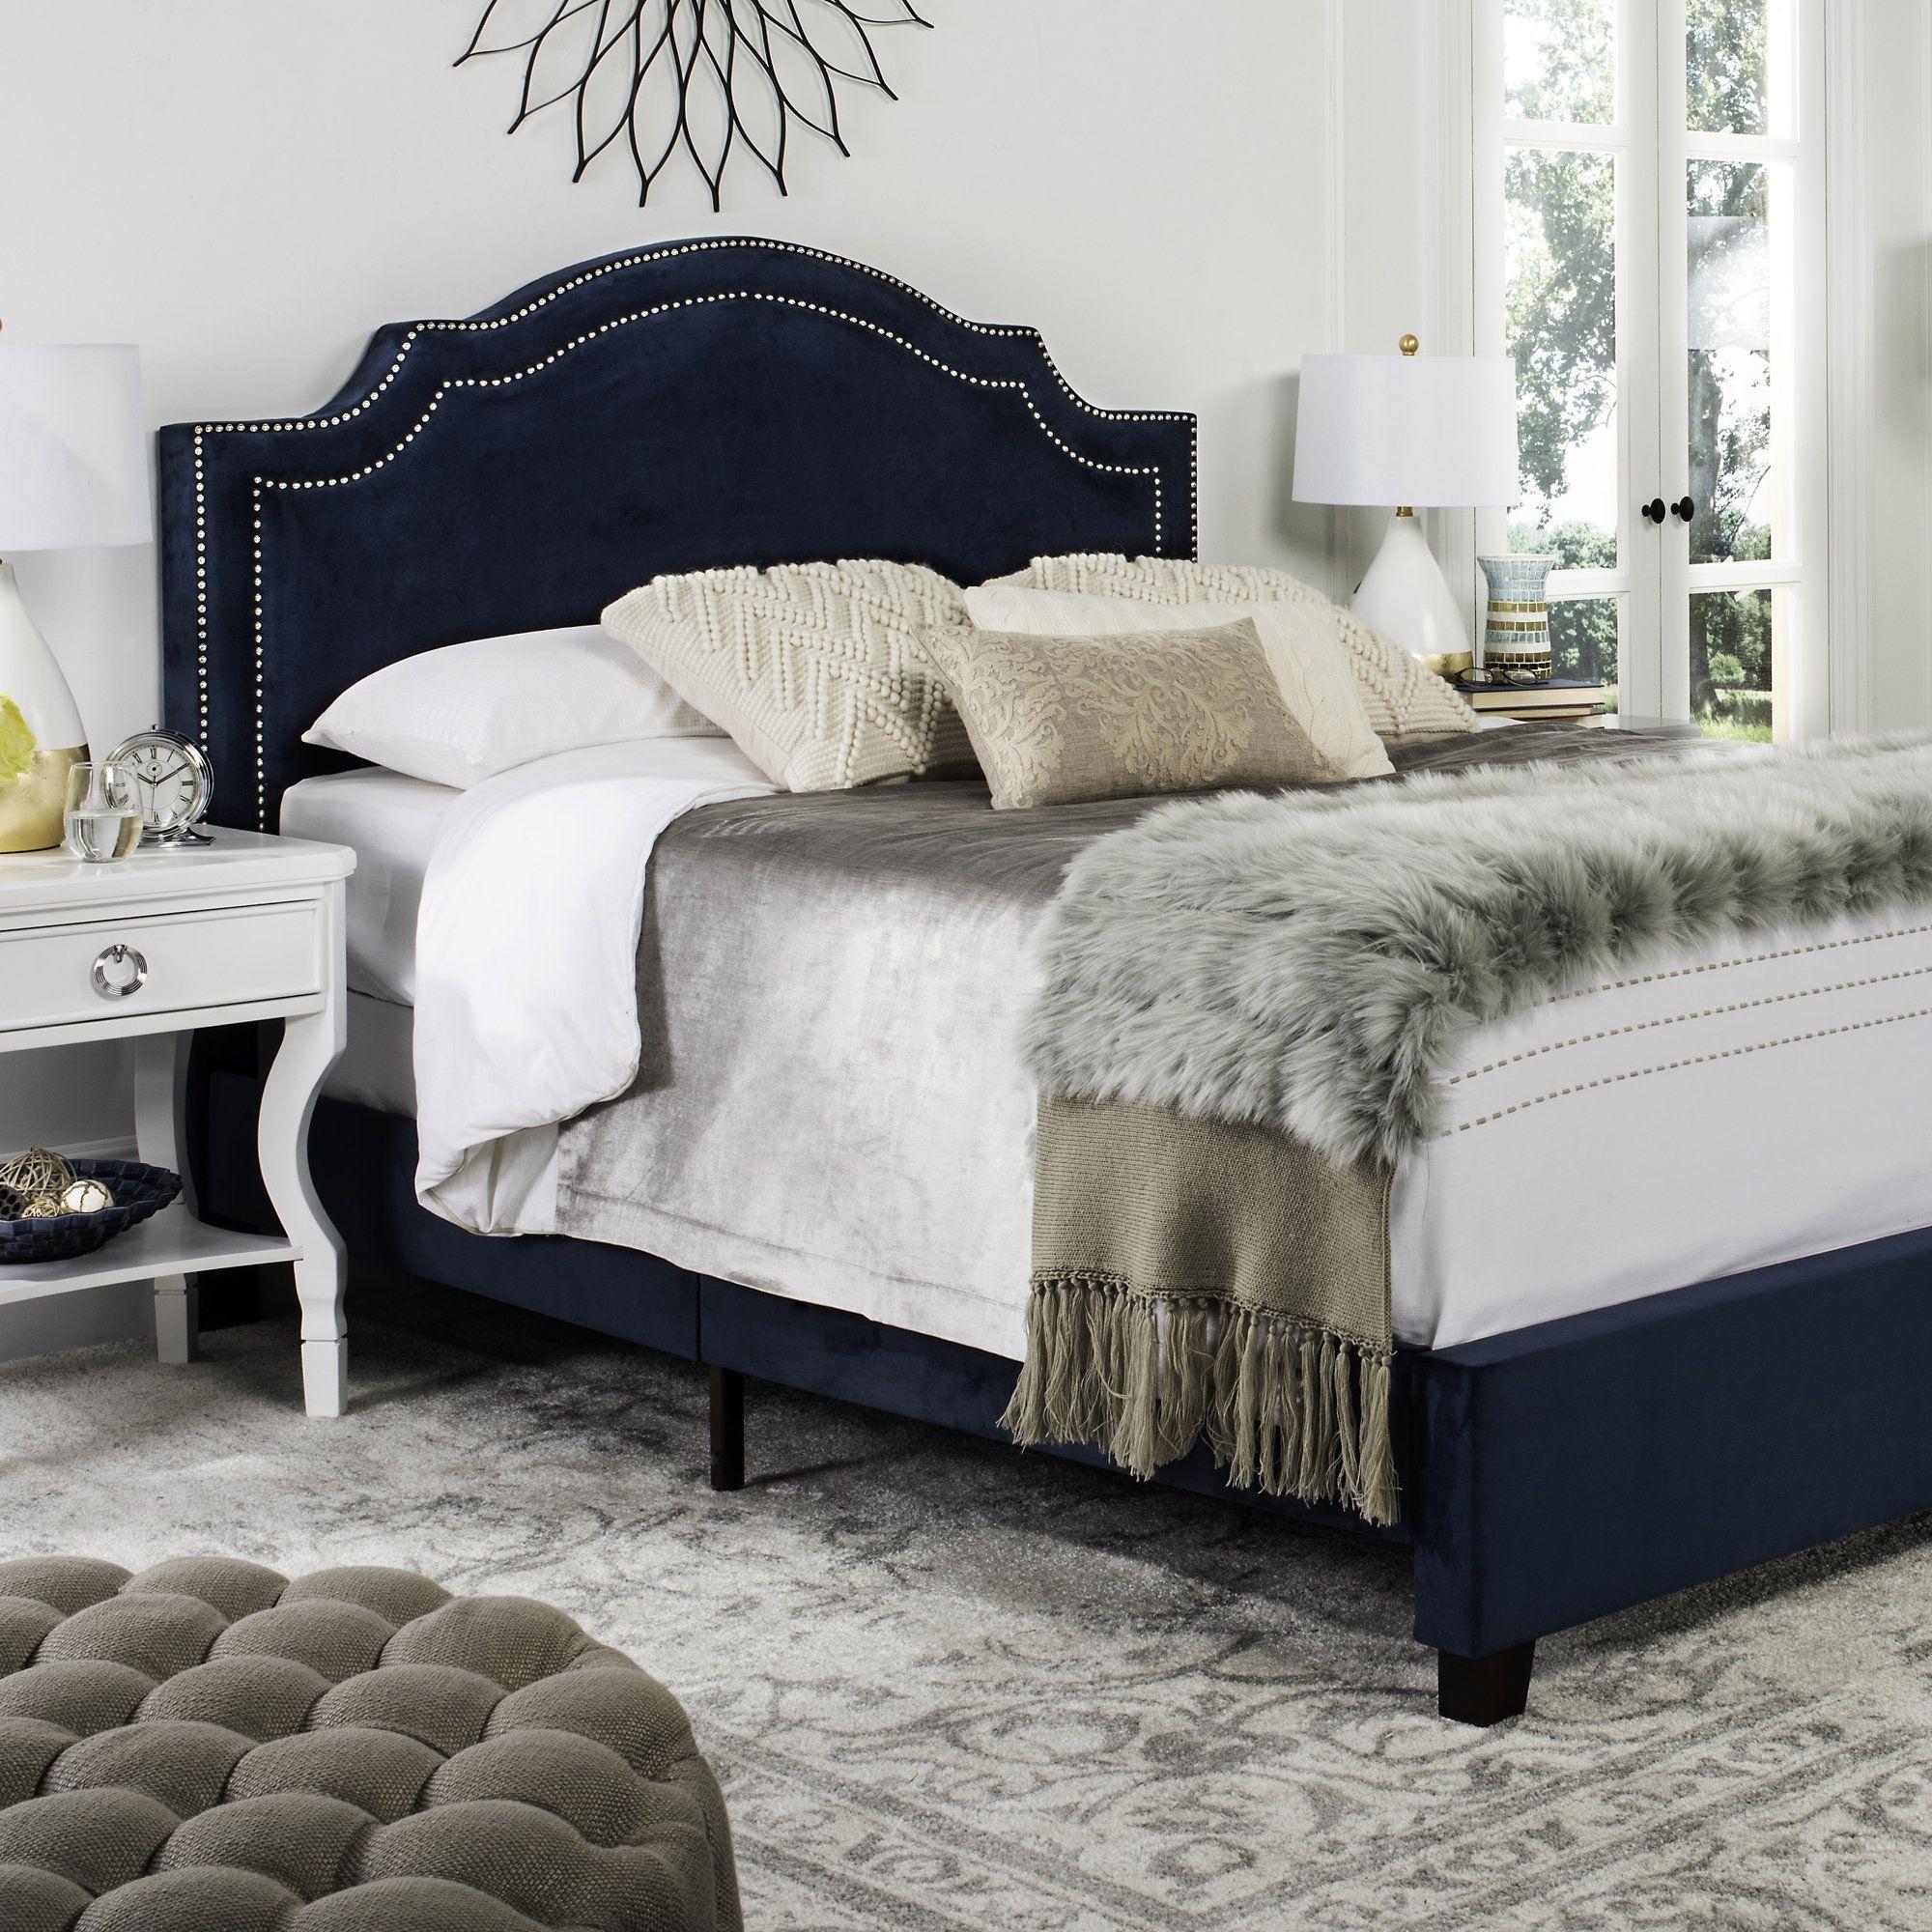 American Furniture Superstore Gilbert: Gilbert Upholstered Panel Bed